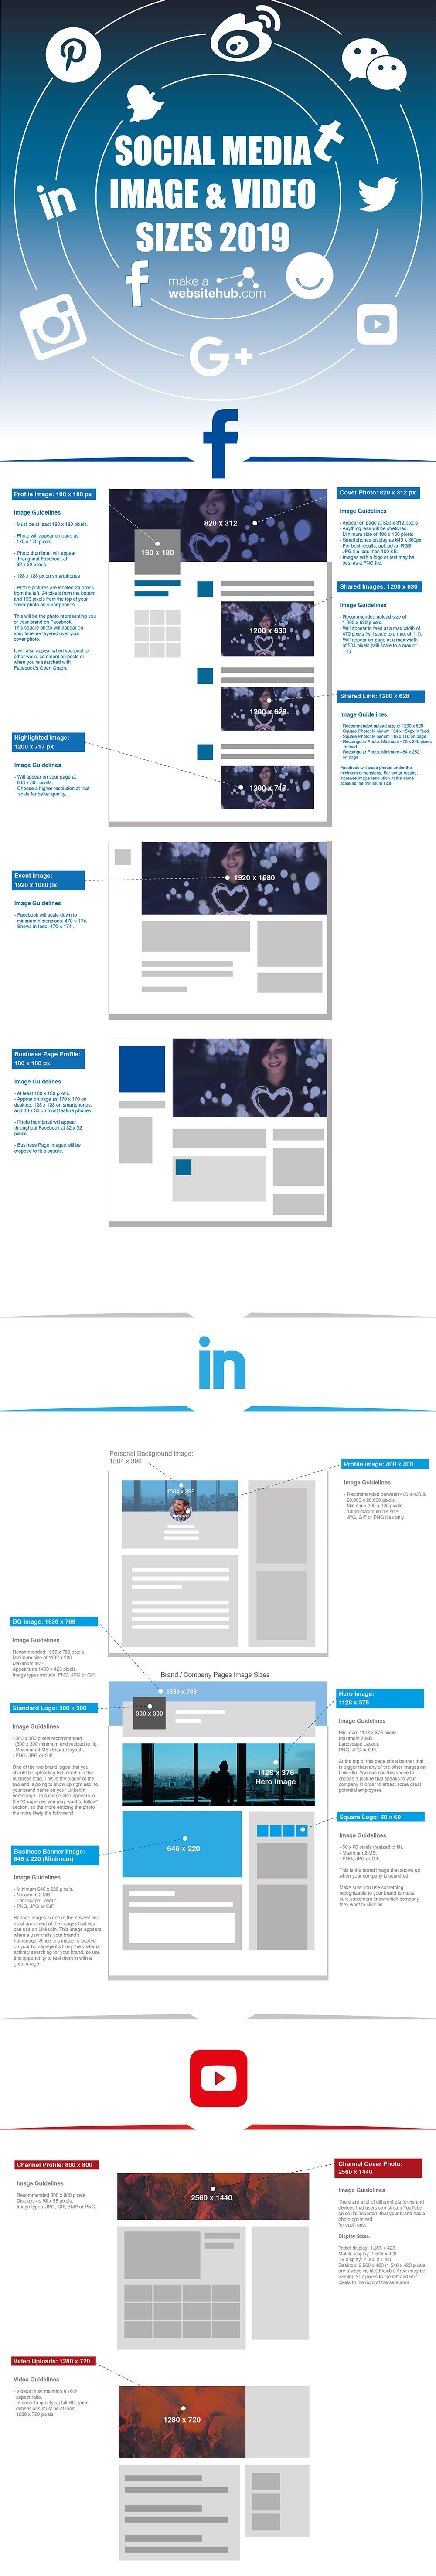 2019 Social Media Image Sizes | eproductions interactive web